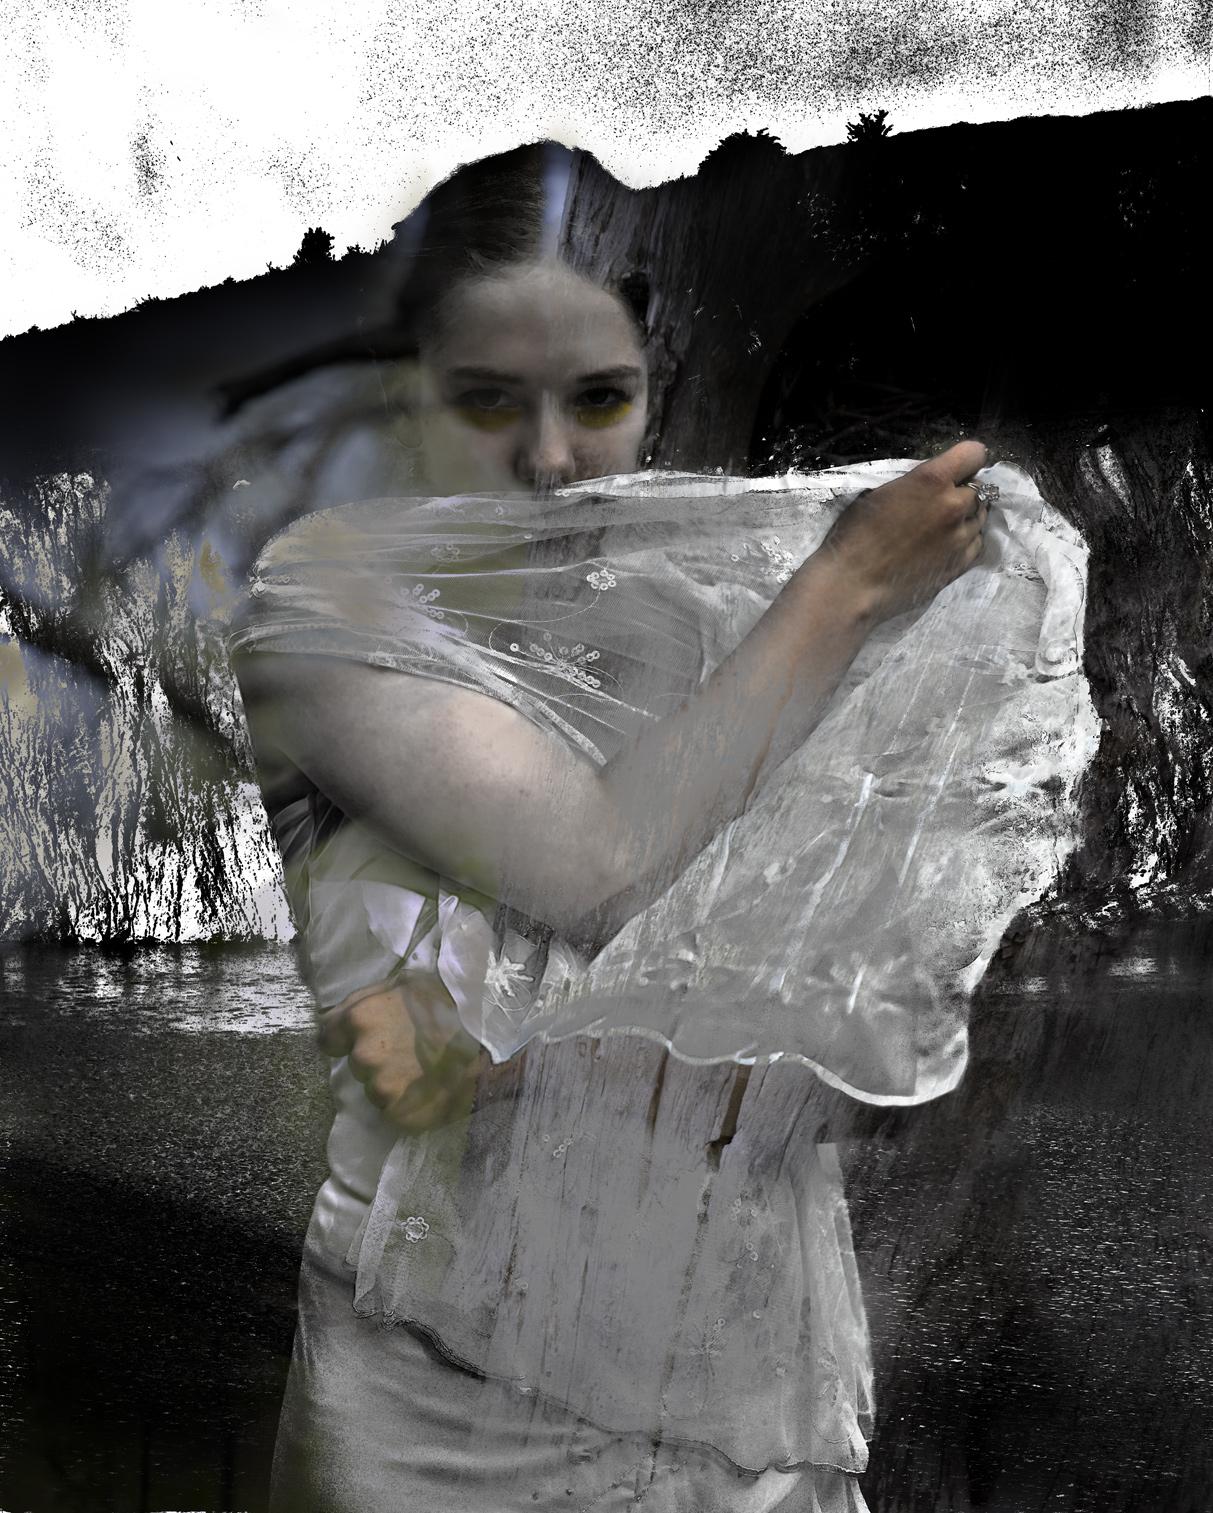 Mira-mot-fyledalen,01